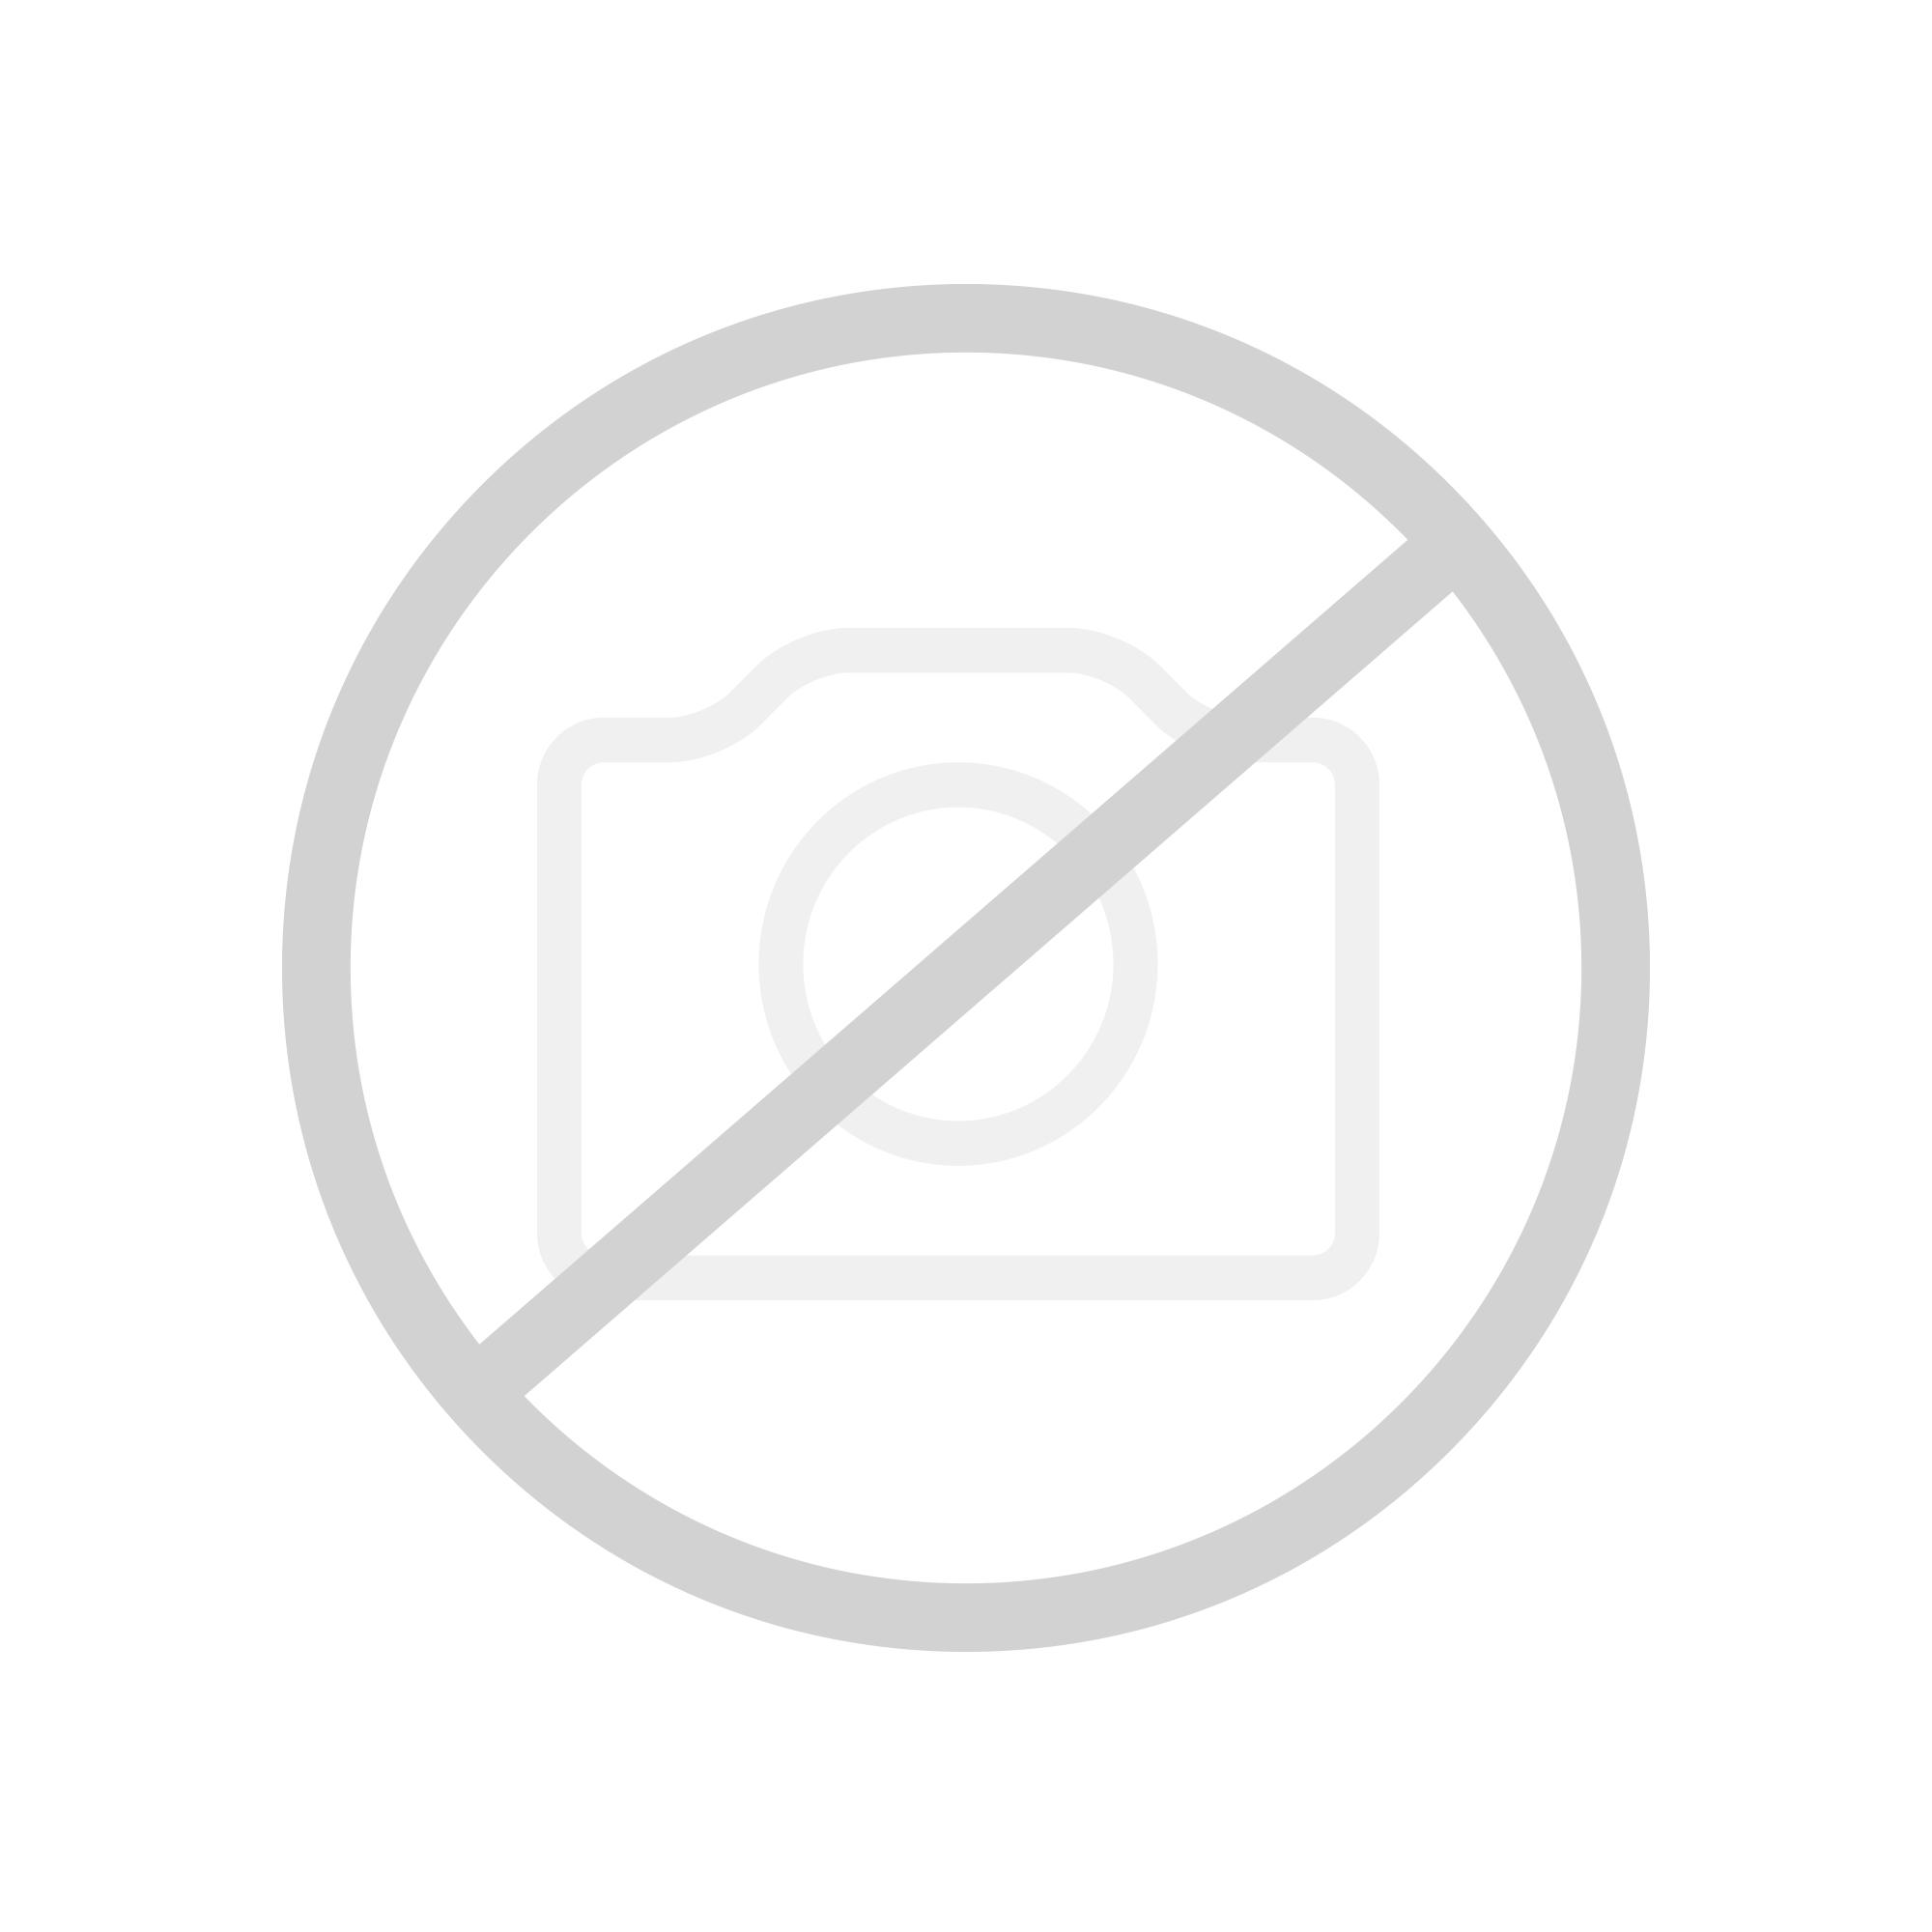 Keuco MOLL Standventil 50 ohne Ablaufgarnitur, edelstahl